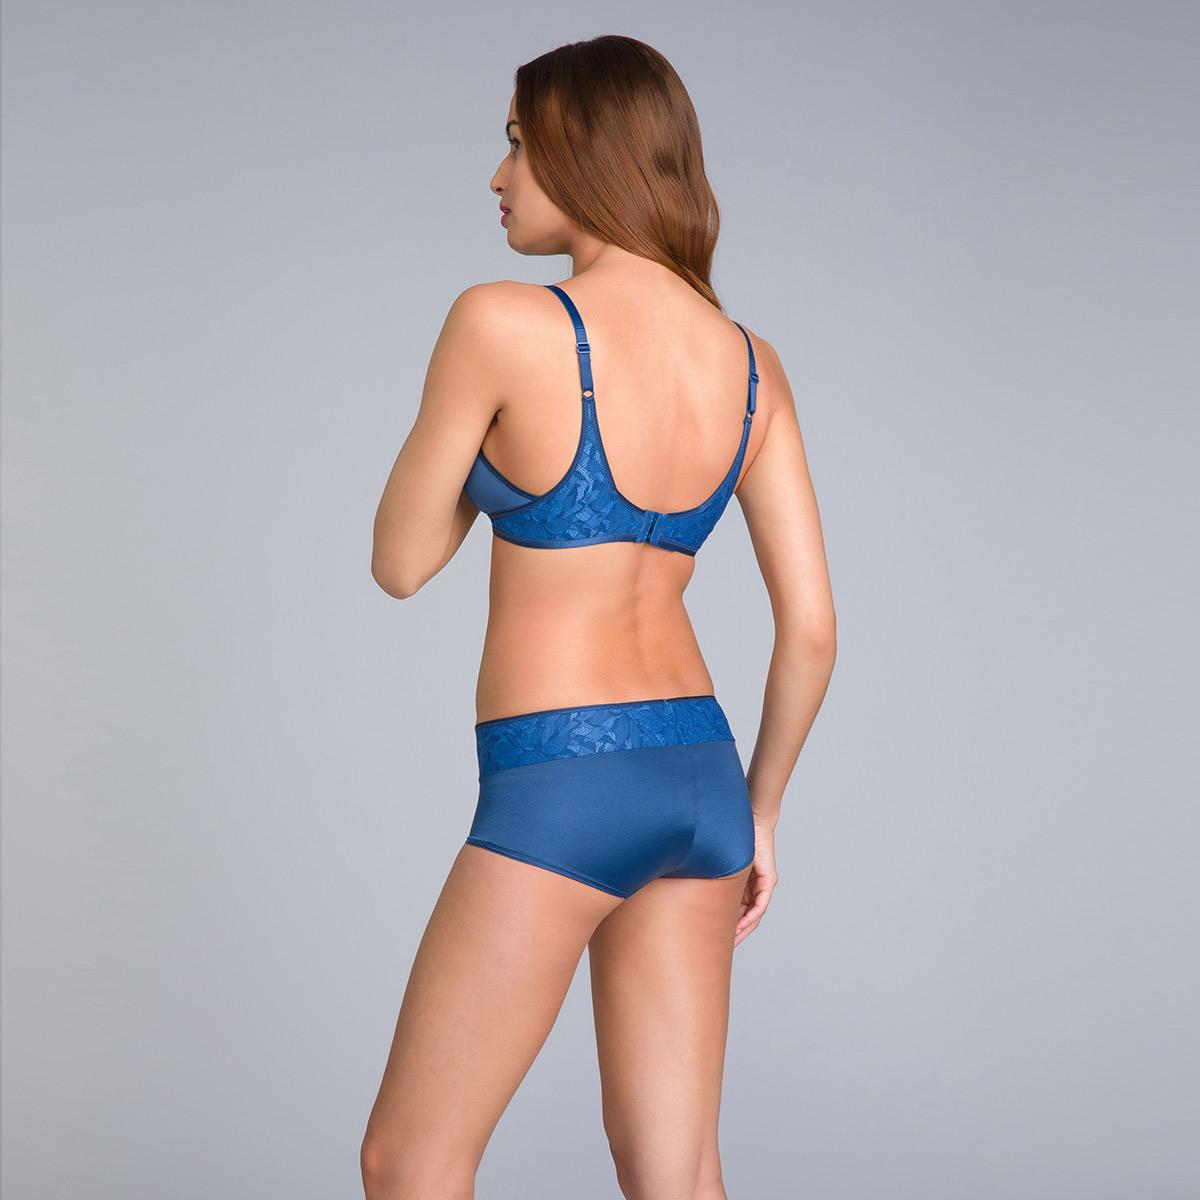 Reggiseno senza ferretto blu navy - Ideal Beauty Lace - PLAYTEX